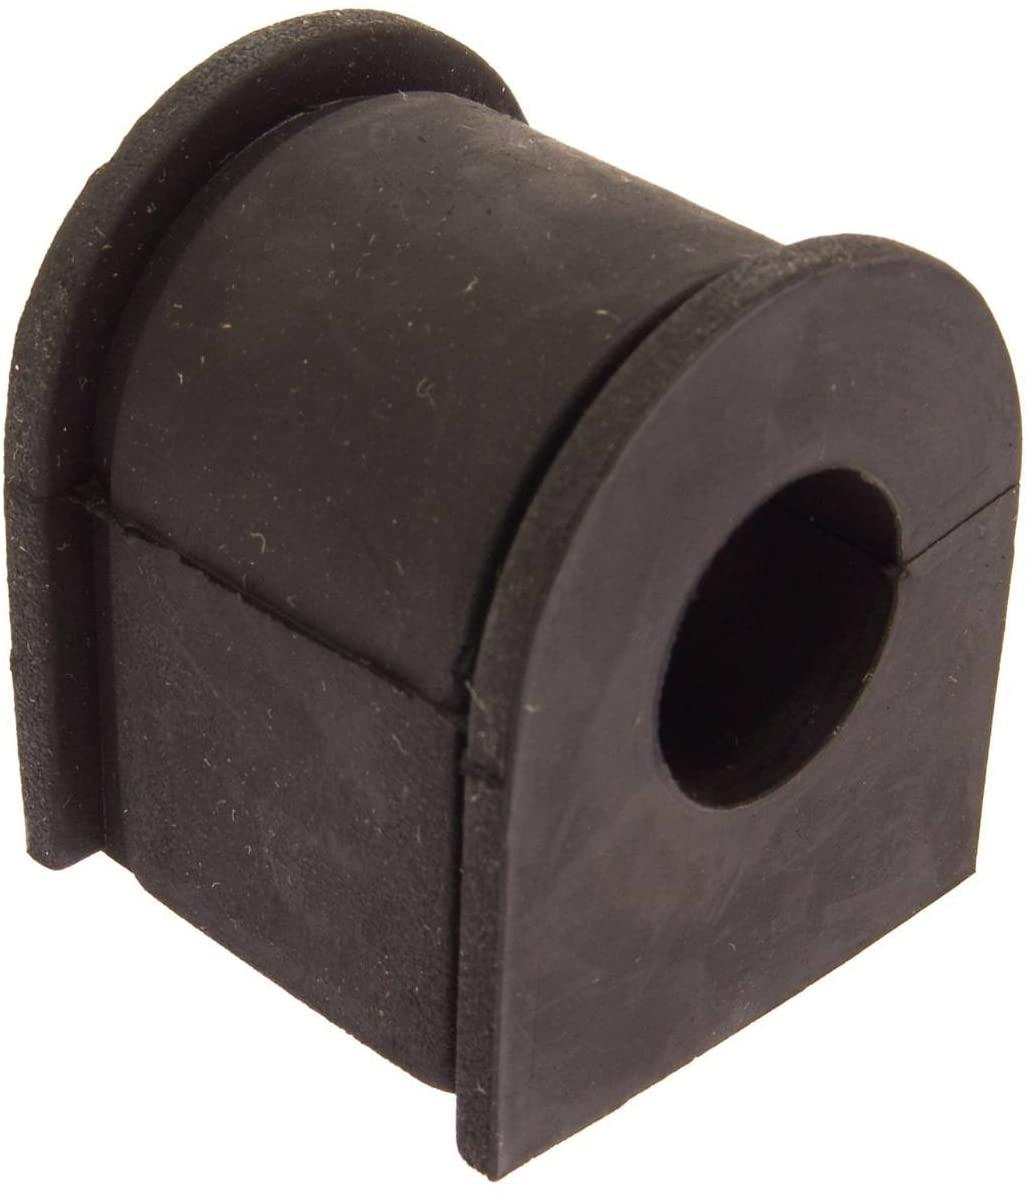 54613-04F00 / 5461304F00 - Rear Stabilizer Bushing D18 For Nissan